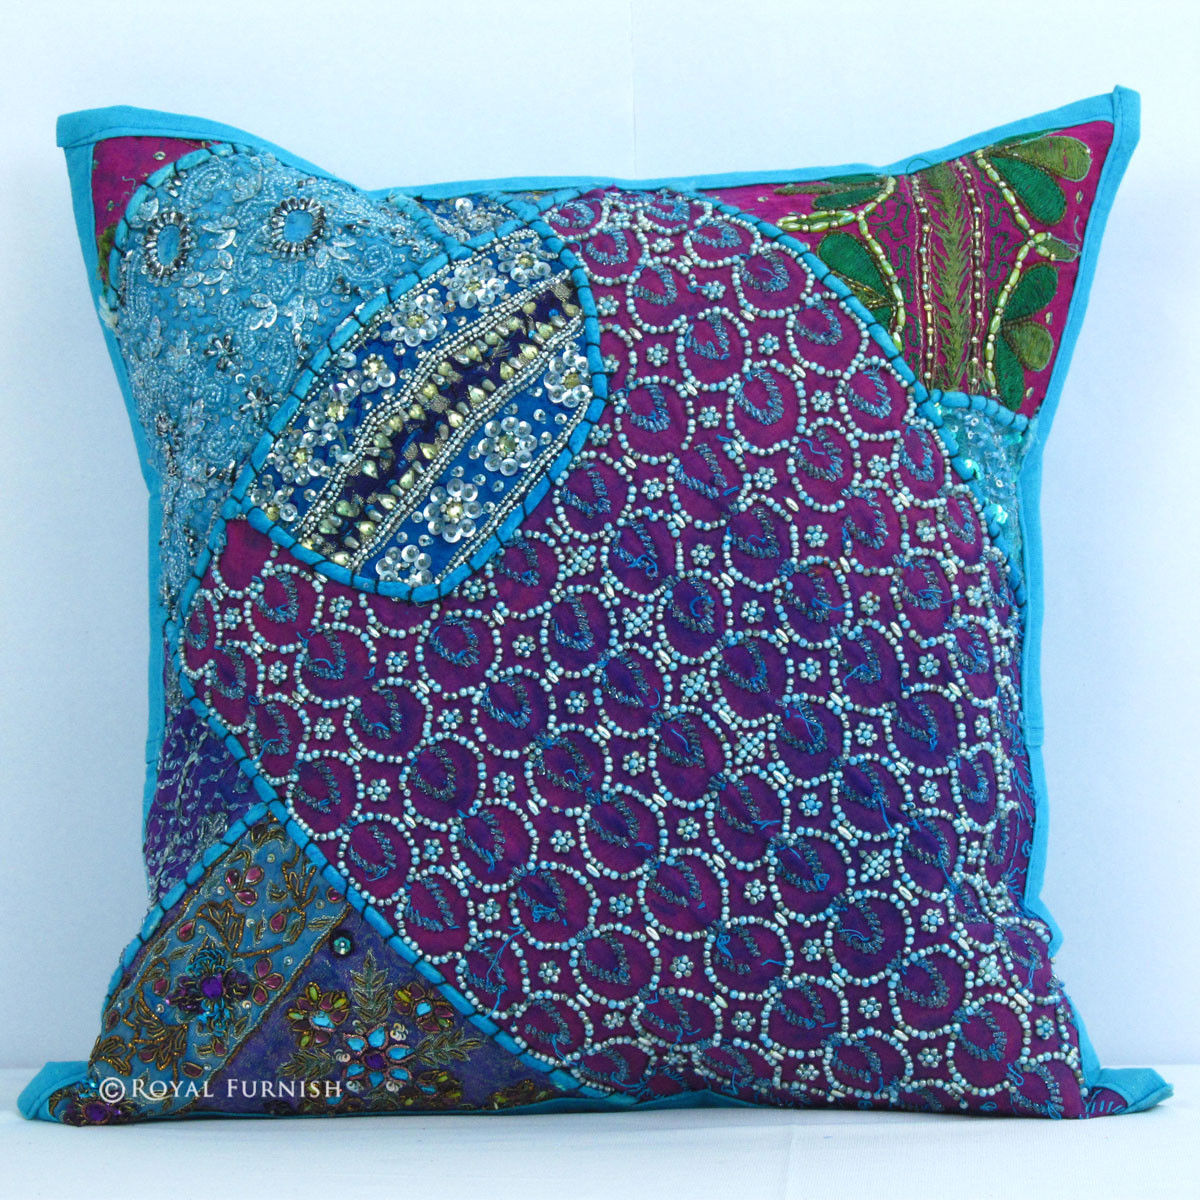 Elegant Handmade Heavy Beaded Indian Vintage Throw Pillow - RoyalFurnish.com